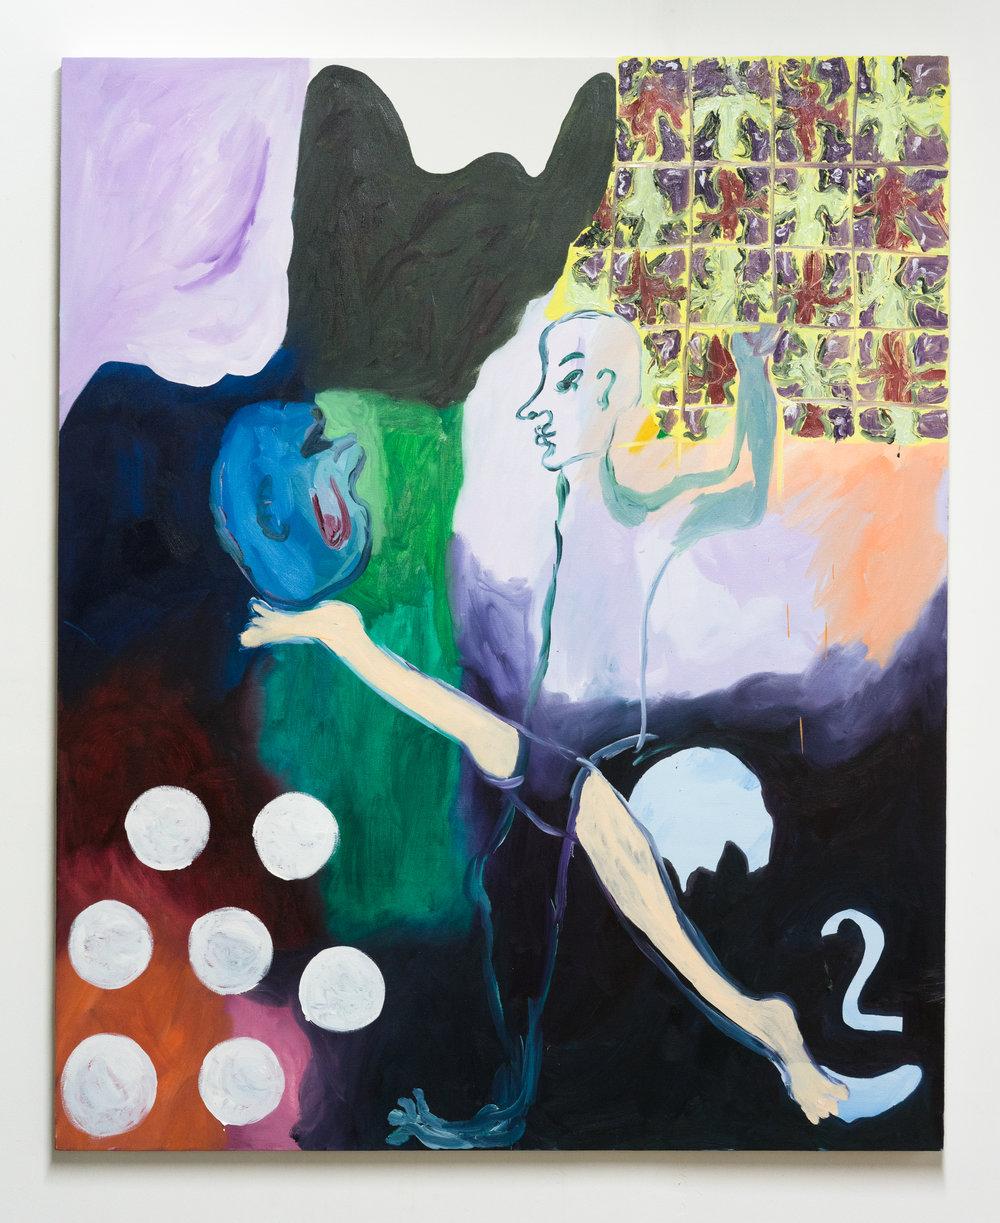 Untitled, (2004)